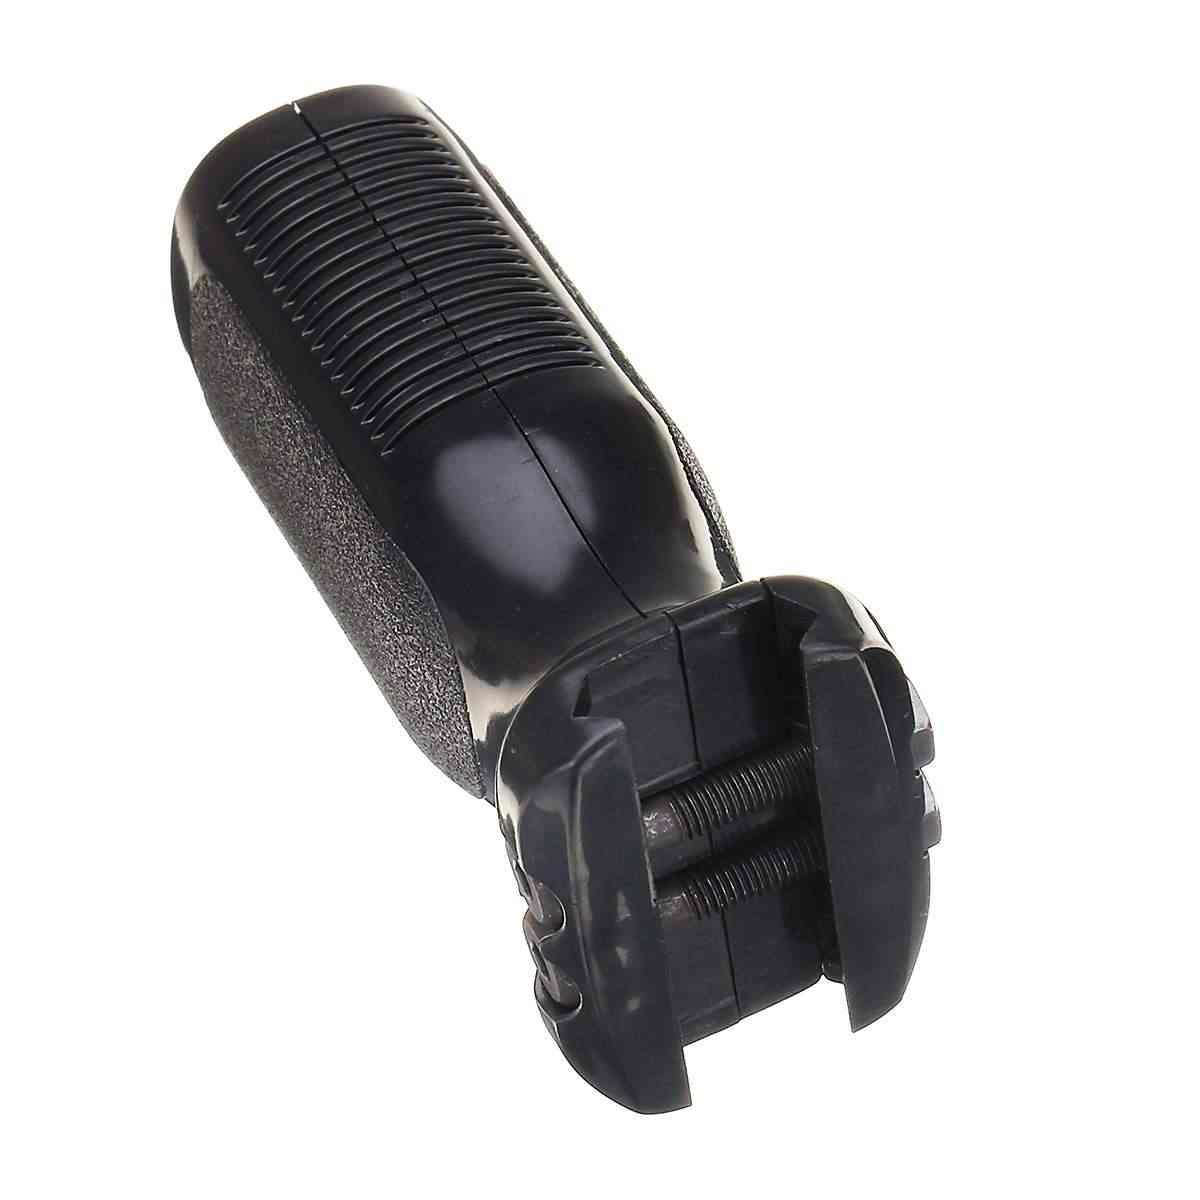 Taktik Airsoft Rvg Stil Ön Dikey Kavrama Tüfek Silah siyah ön için foregrip Picatinny Ön Ray